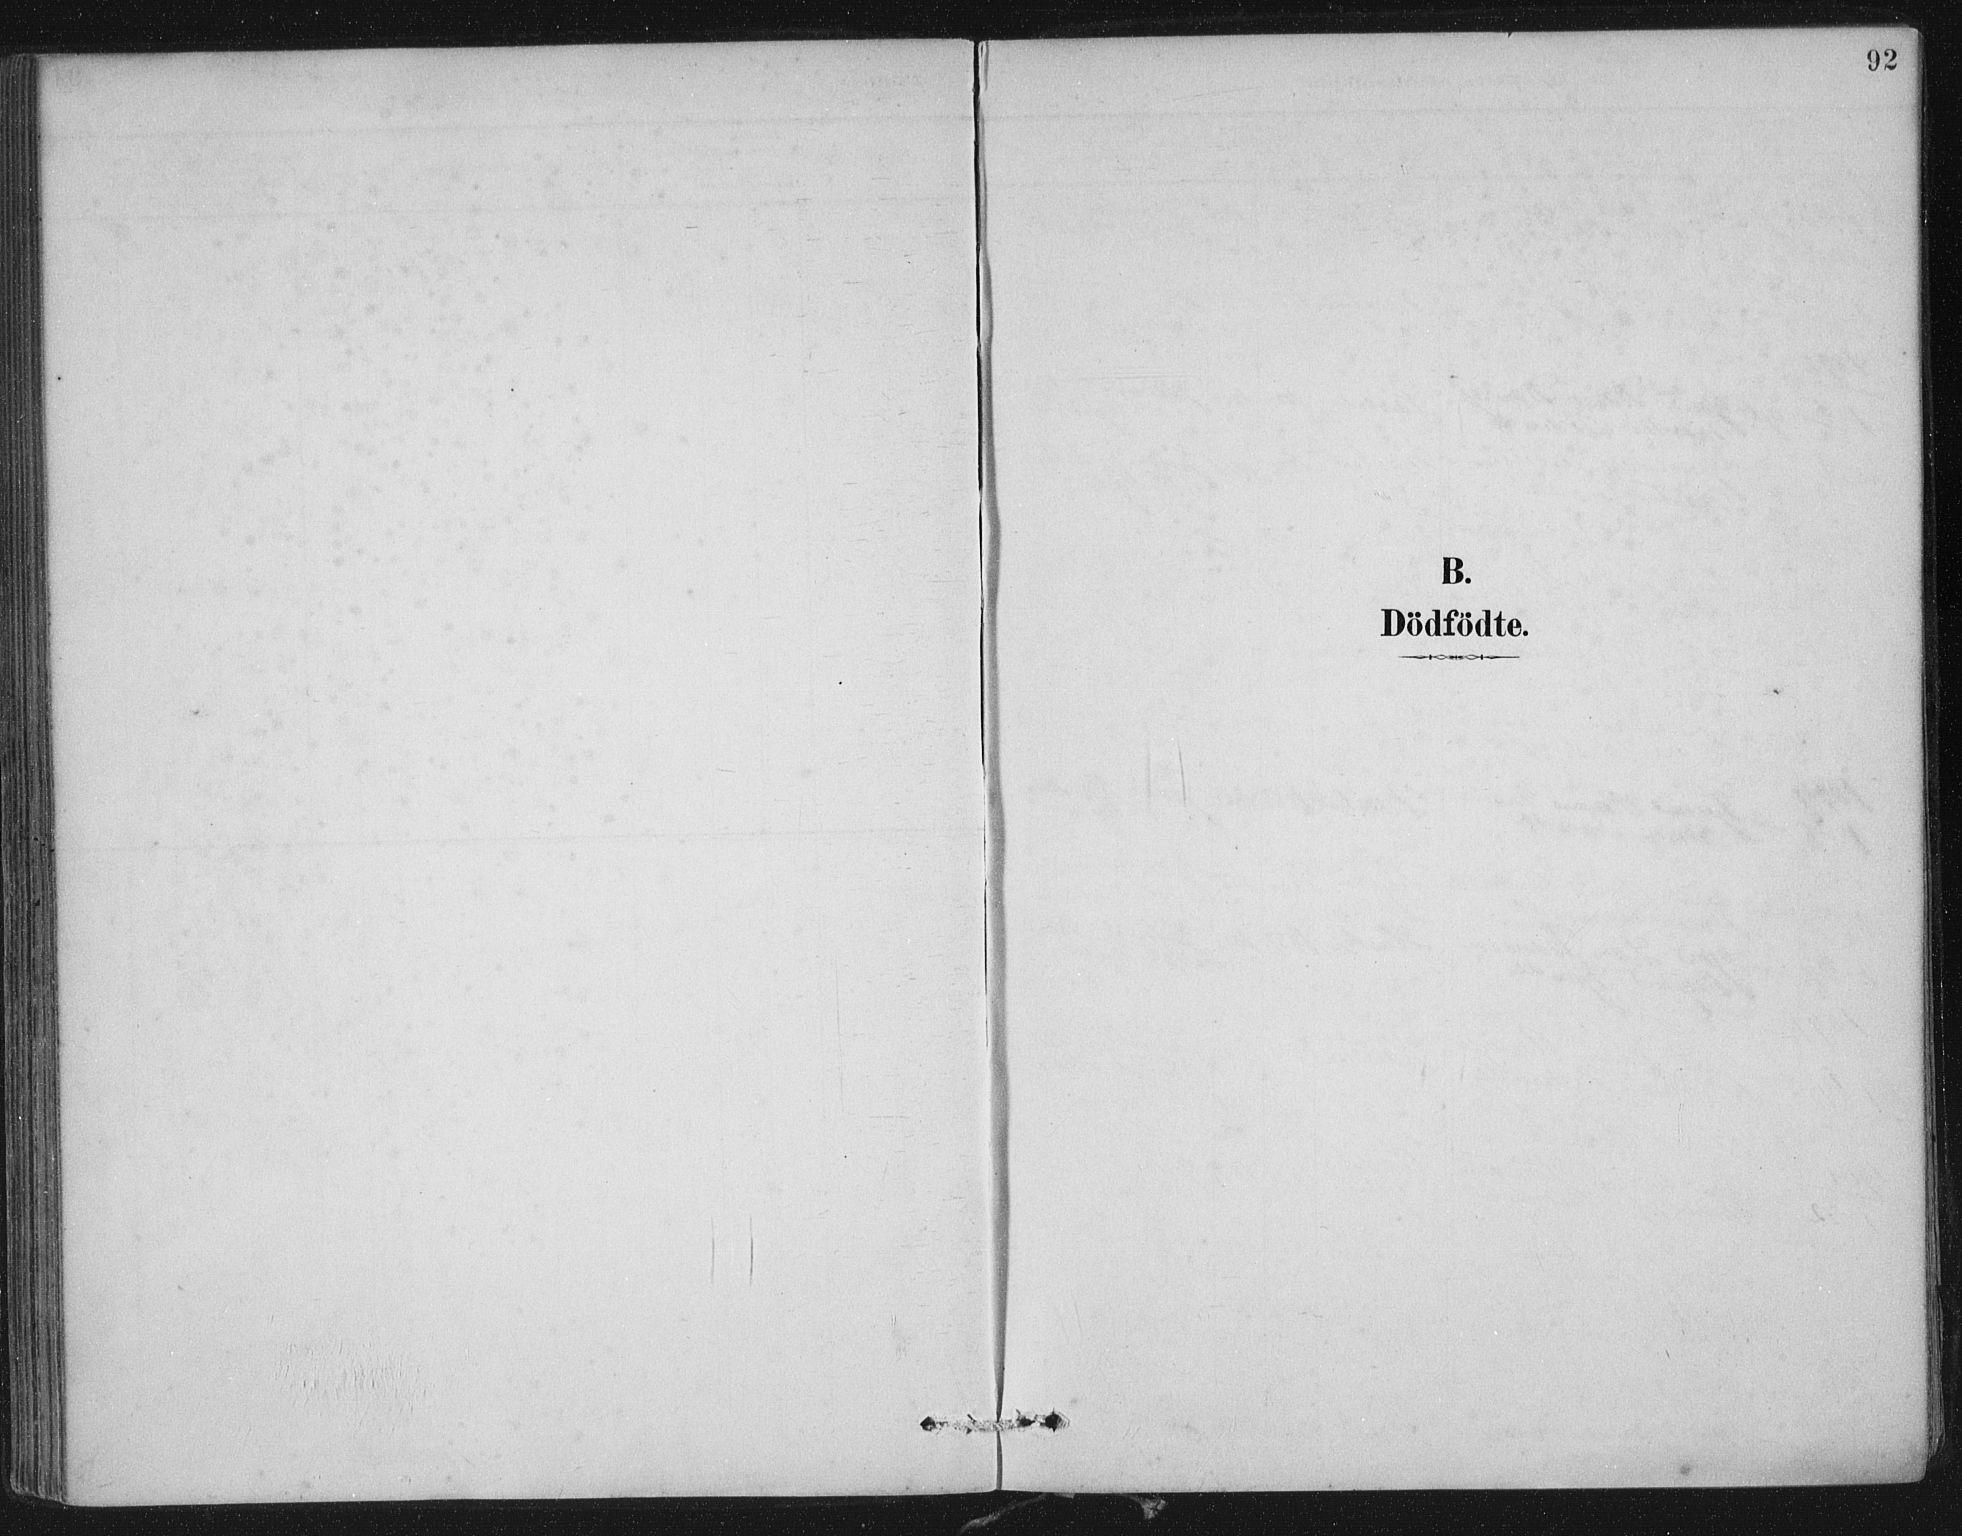 SAST, Nedstrand sokneprestkontor, IV: Ministerialbok nr. A 12, 1887-1915, s. 92